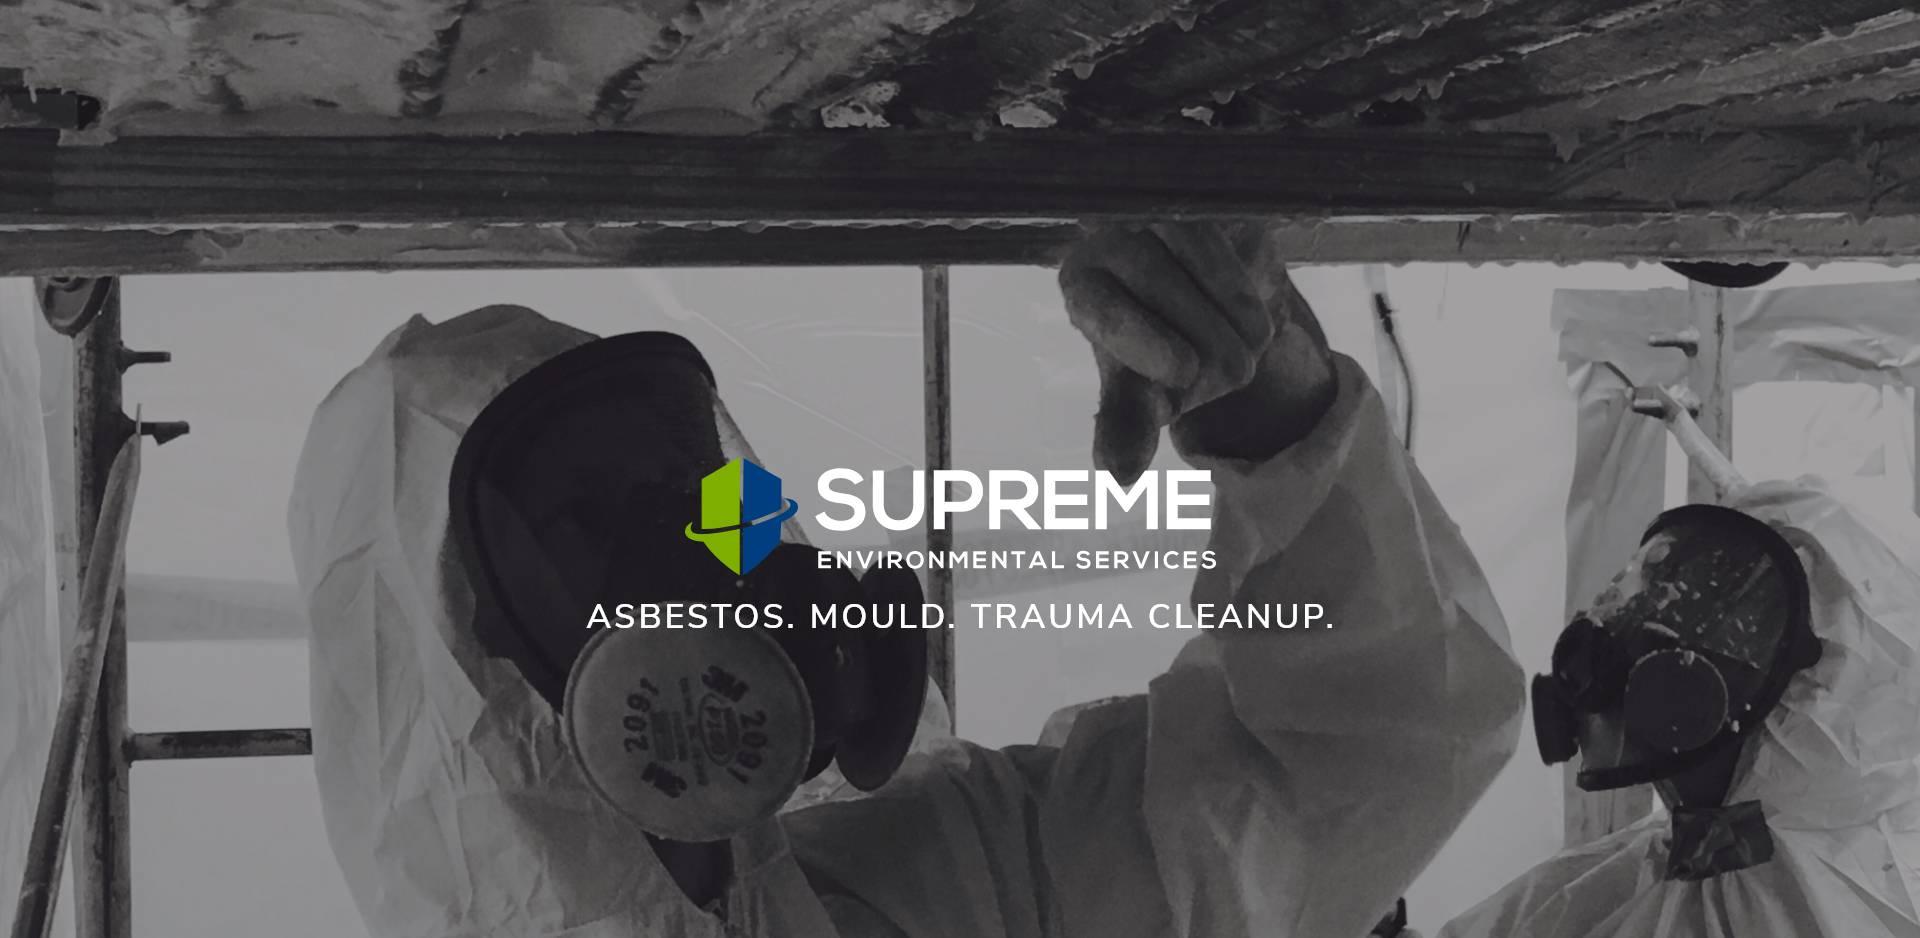 Supreme Environmental Services